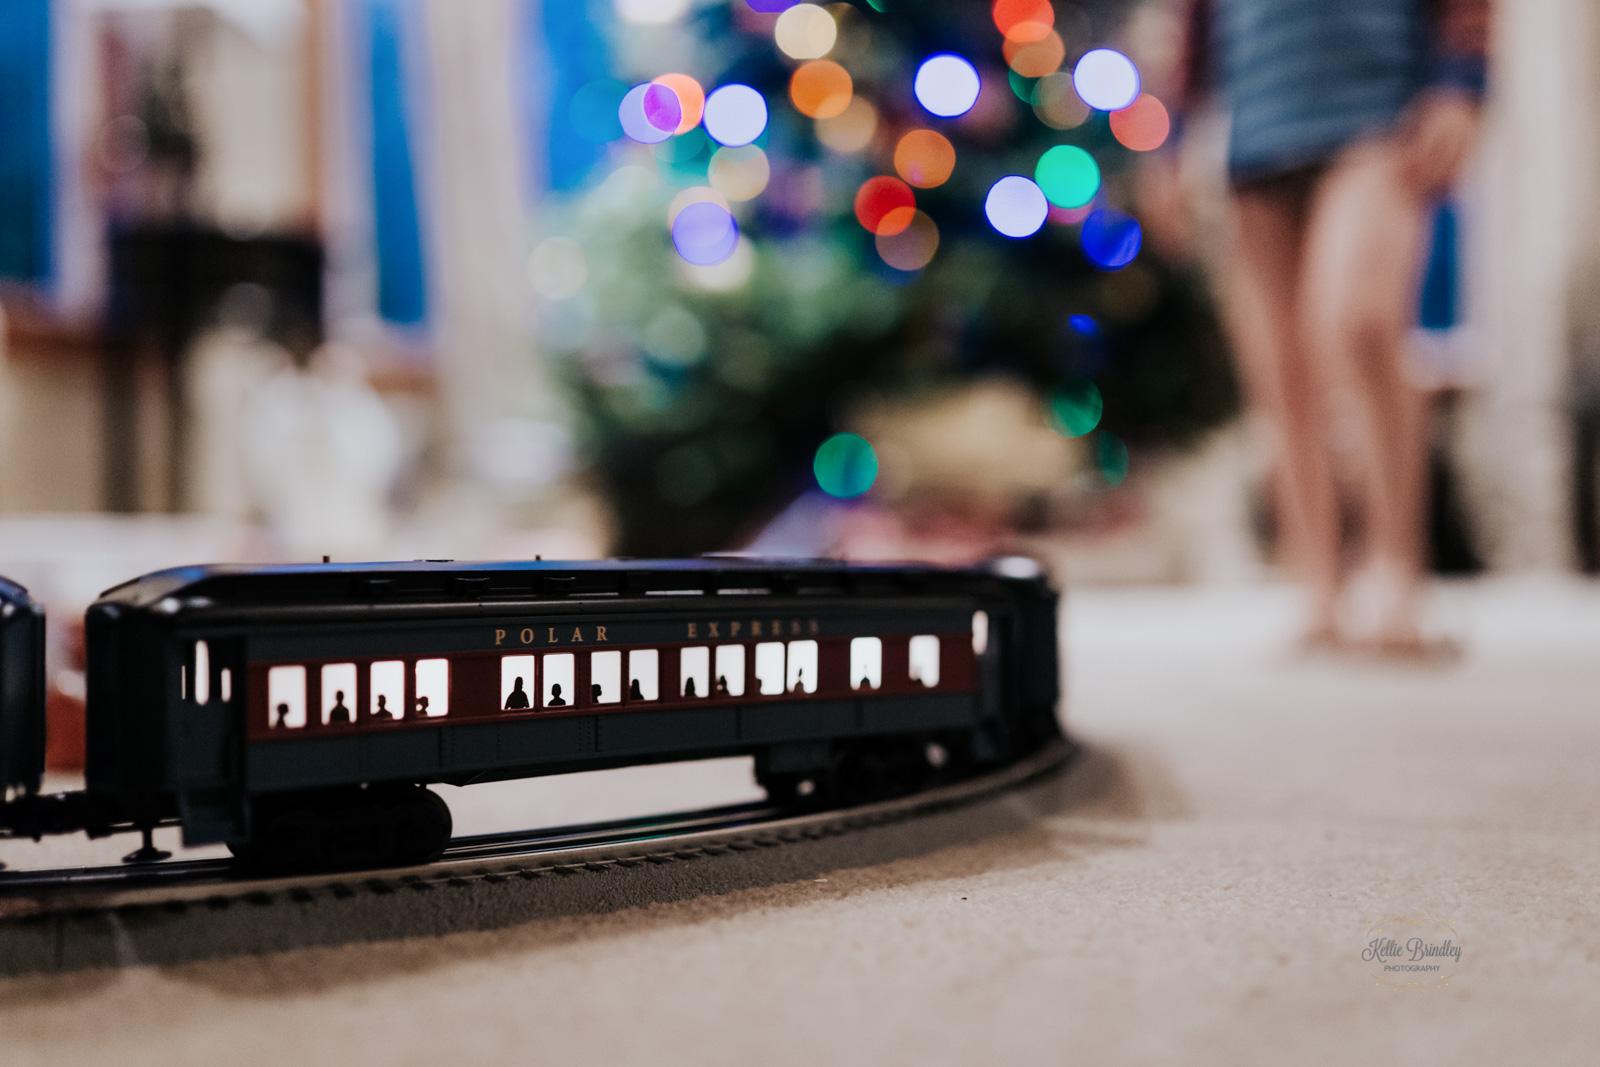 photo of Polar Express train by Kellie Brindley